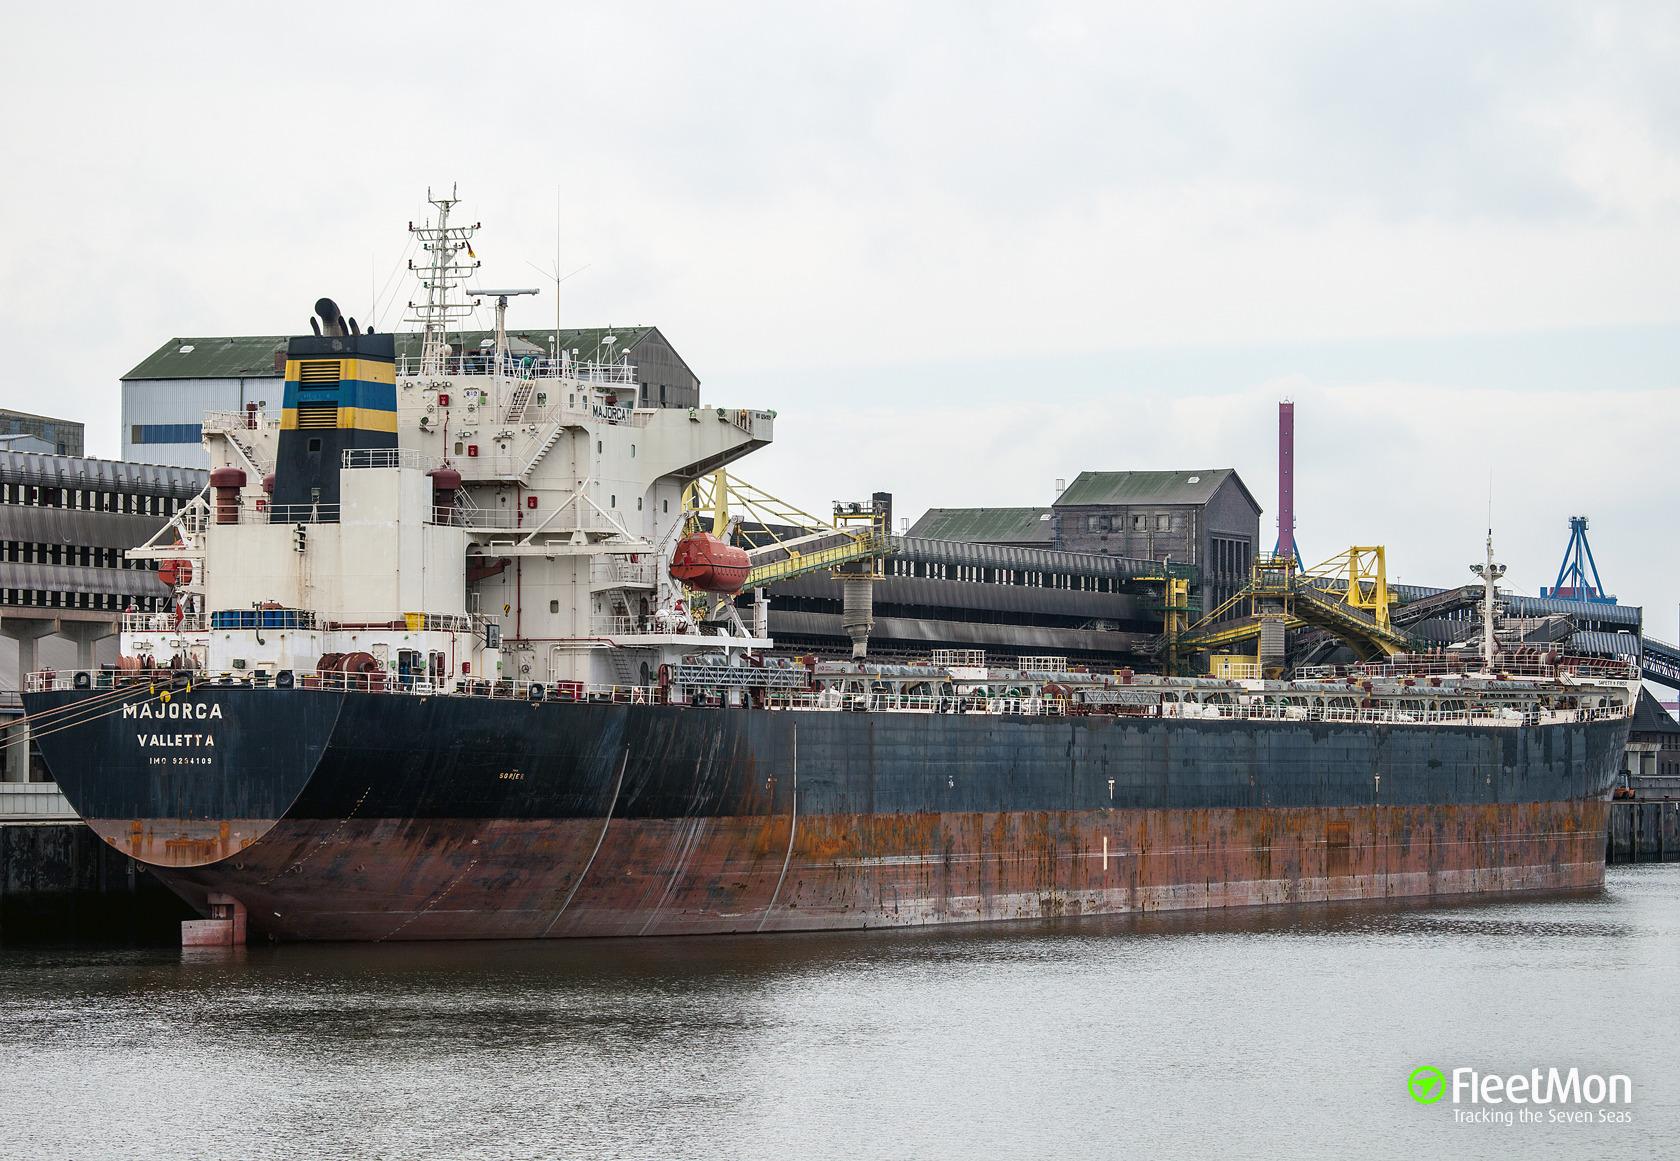 Bulk carrier Majorca medevac